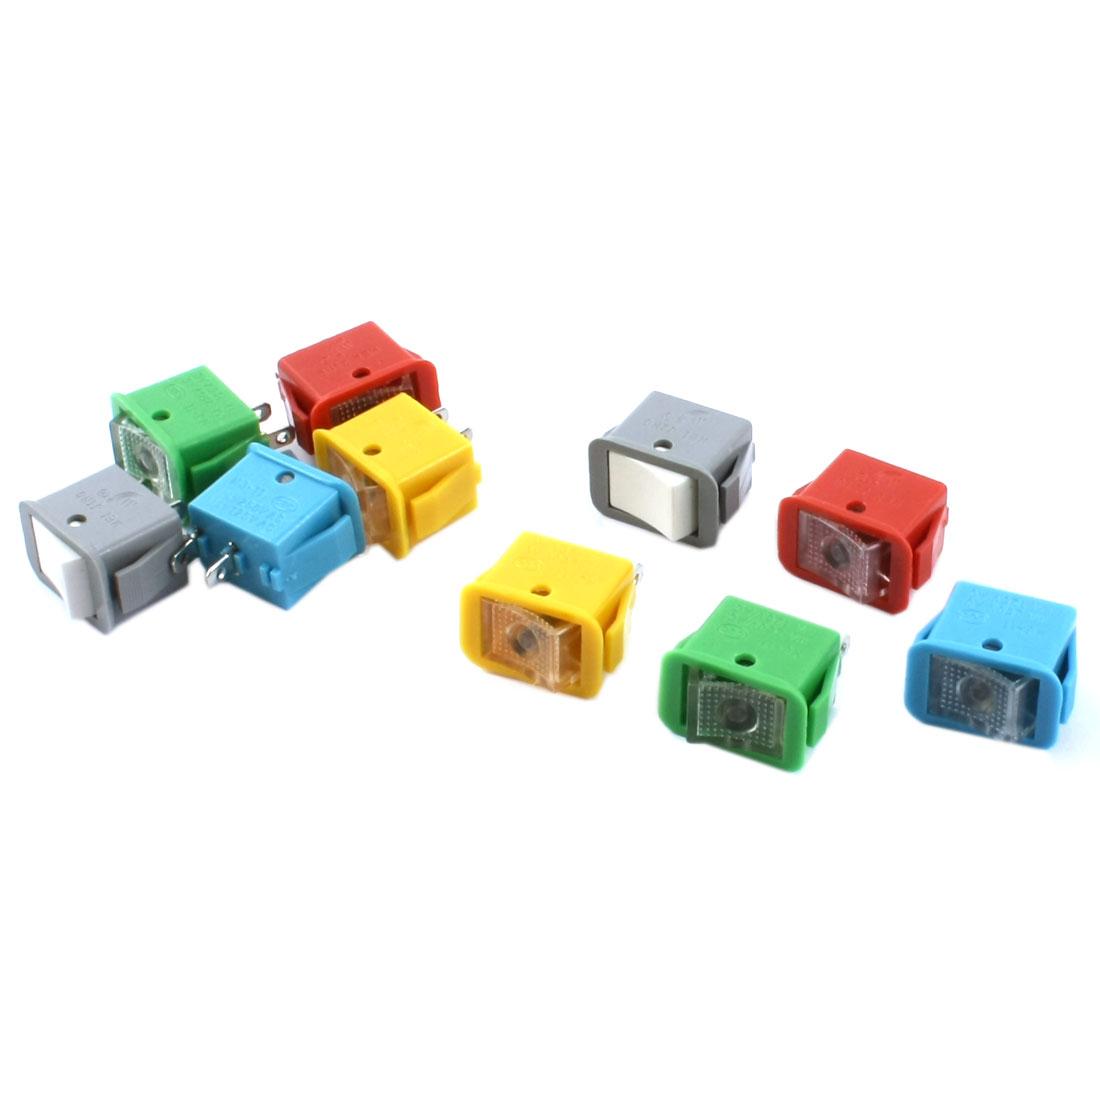 10pcs Latching SPST 2 Positions Rocker Switch AC250V/10A 125V/13A Colorful